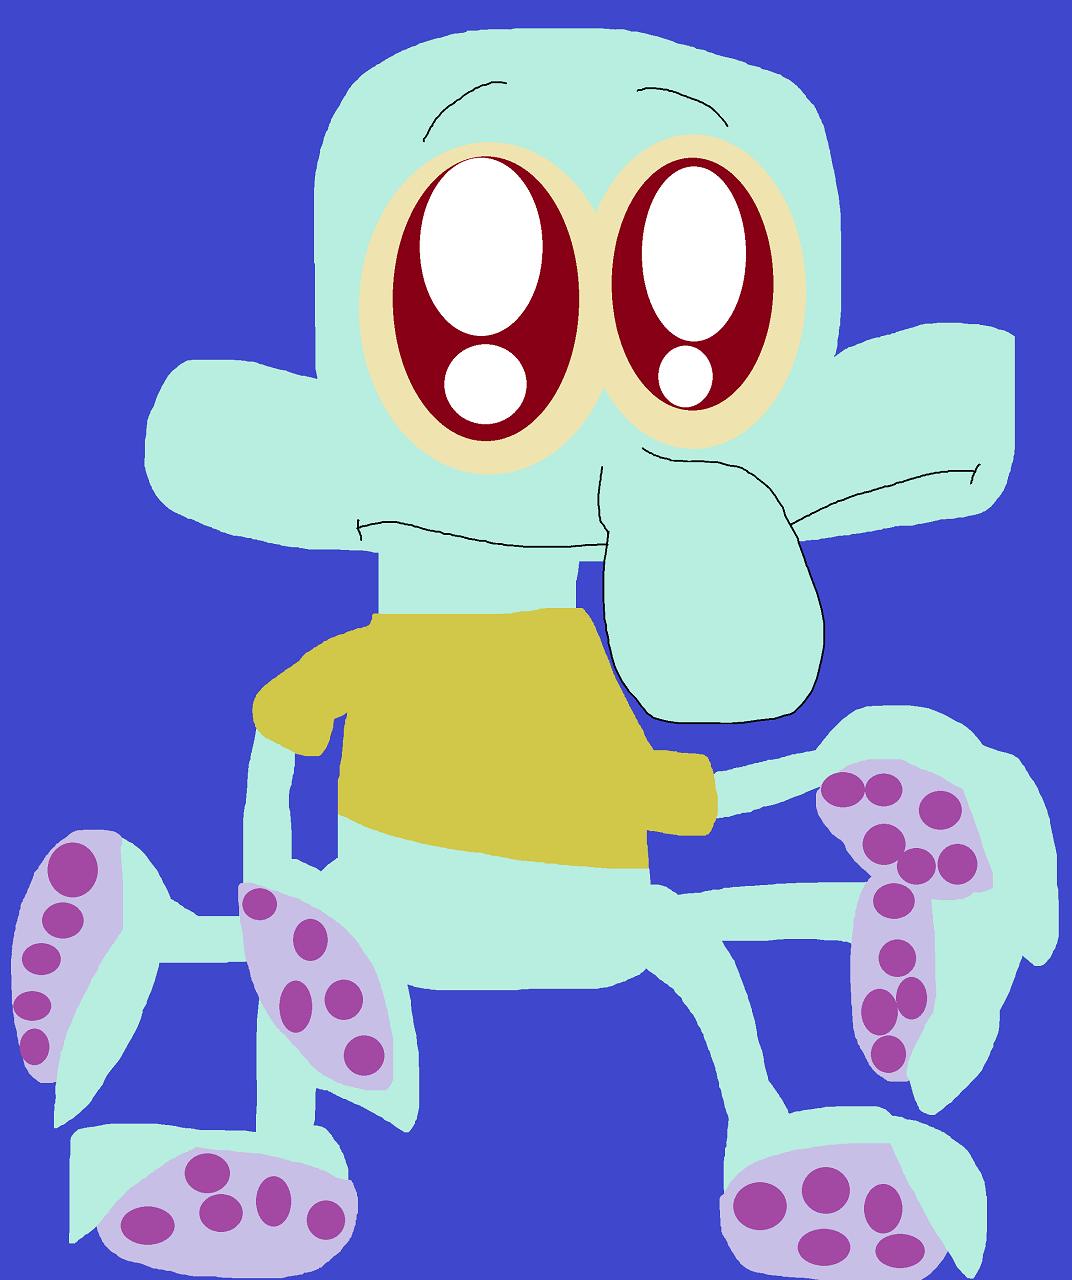 Random Adorable Eyed Squidward by Falconlobo